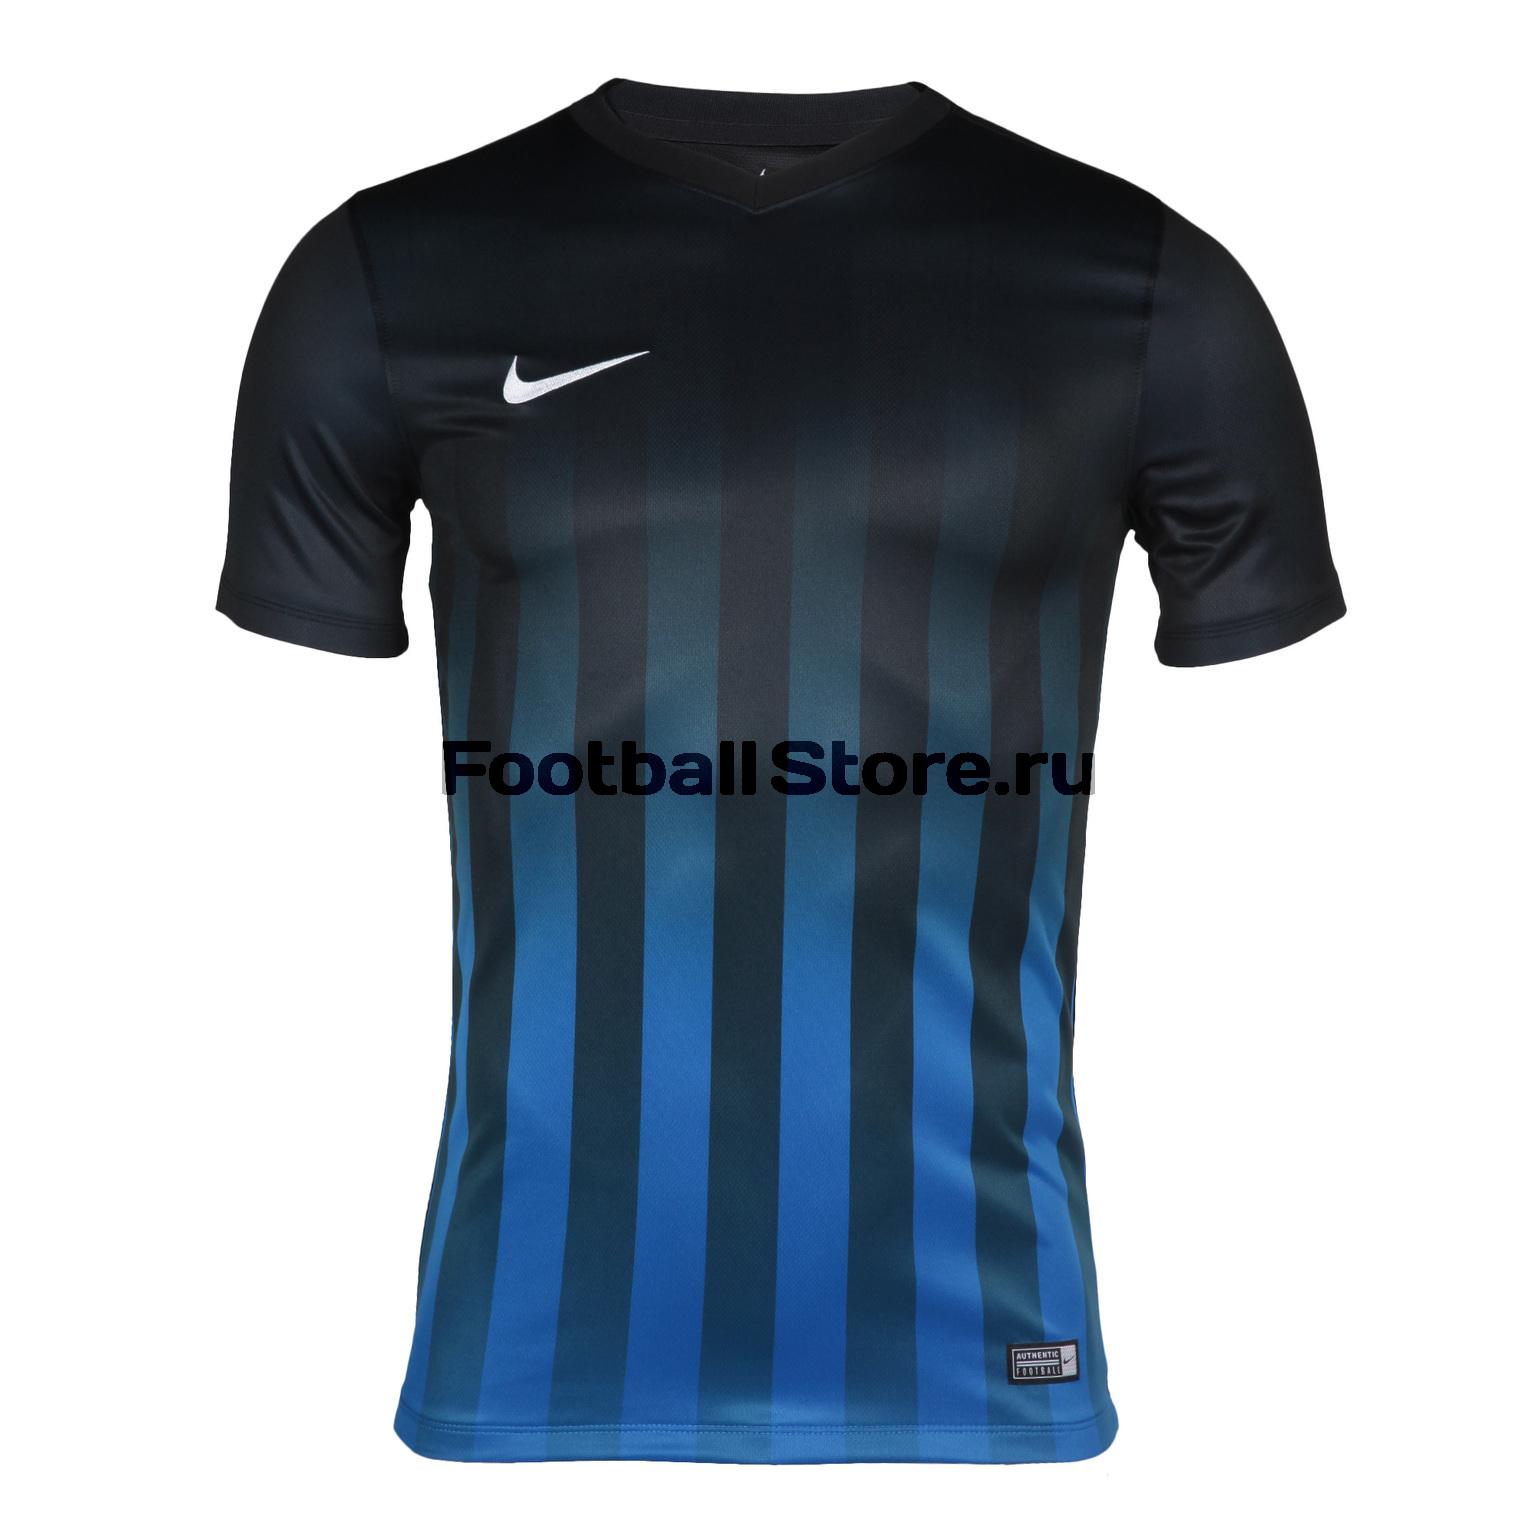 Футболка Nike SS Striped Division II JSY 725893-011 nike nike precision ii ss jersey